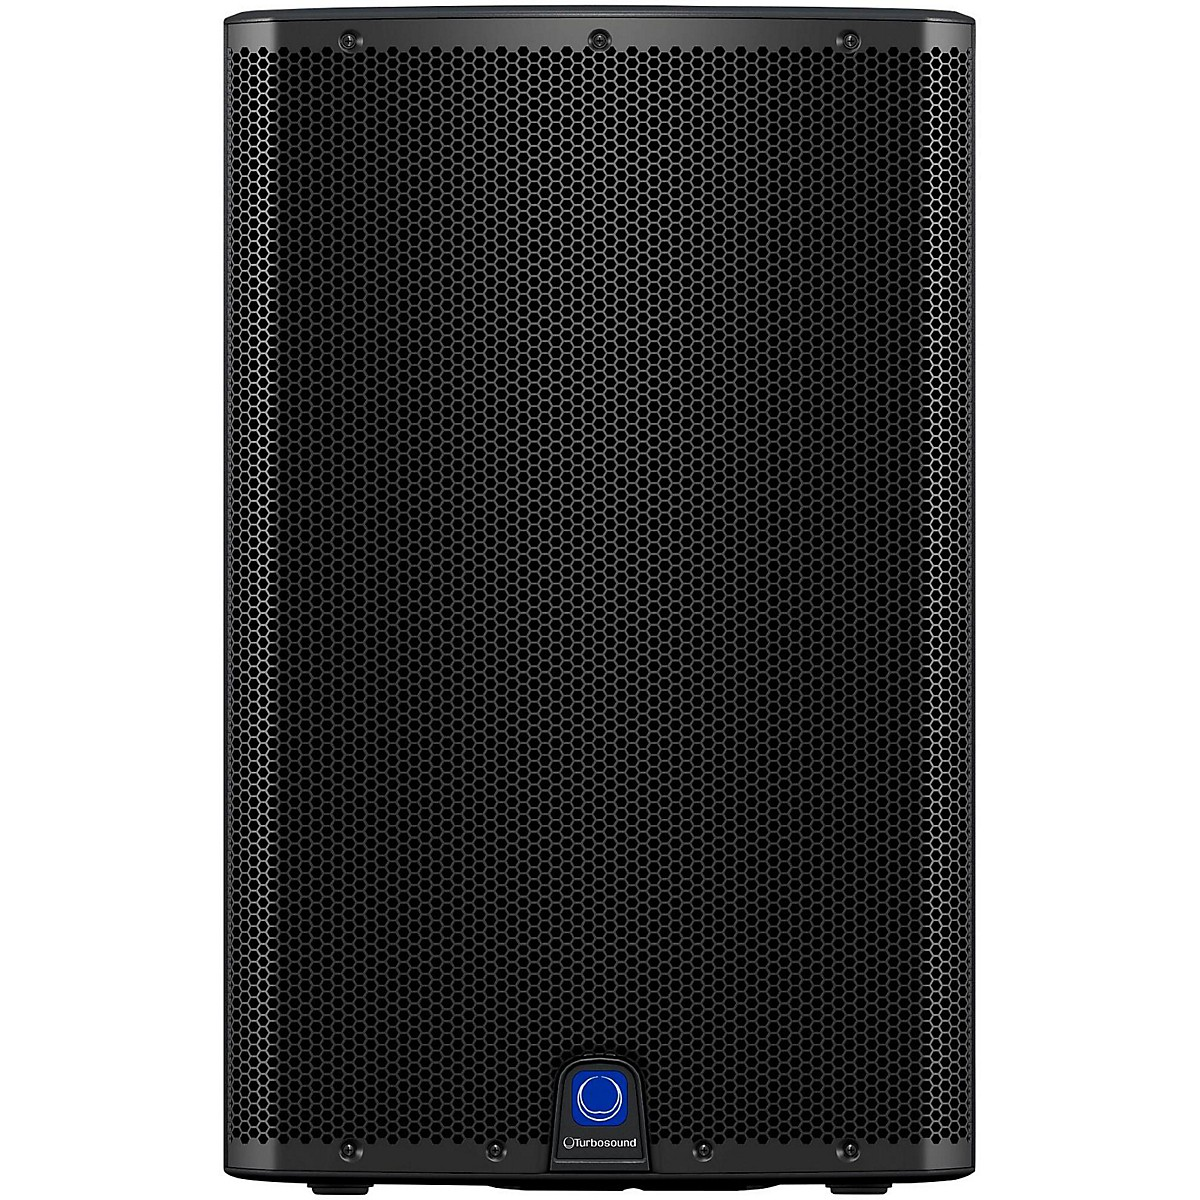 Turbosound iQ15 15 Inch Powered Loudspeaker